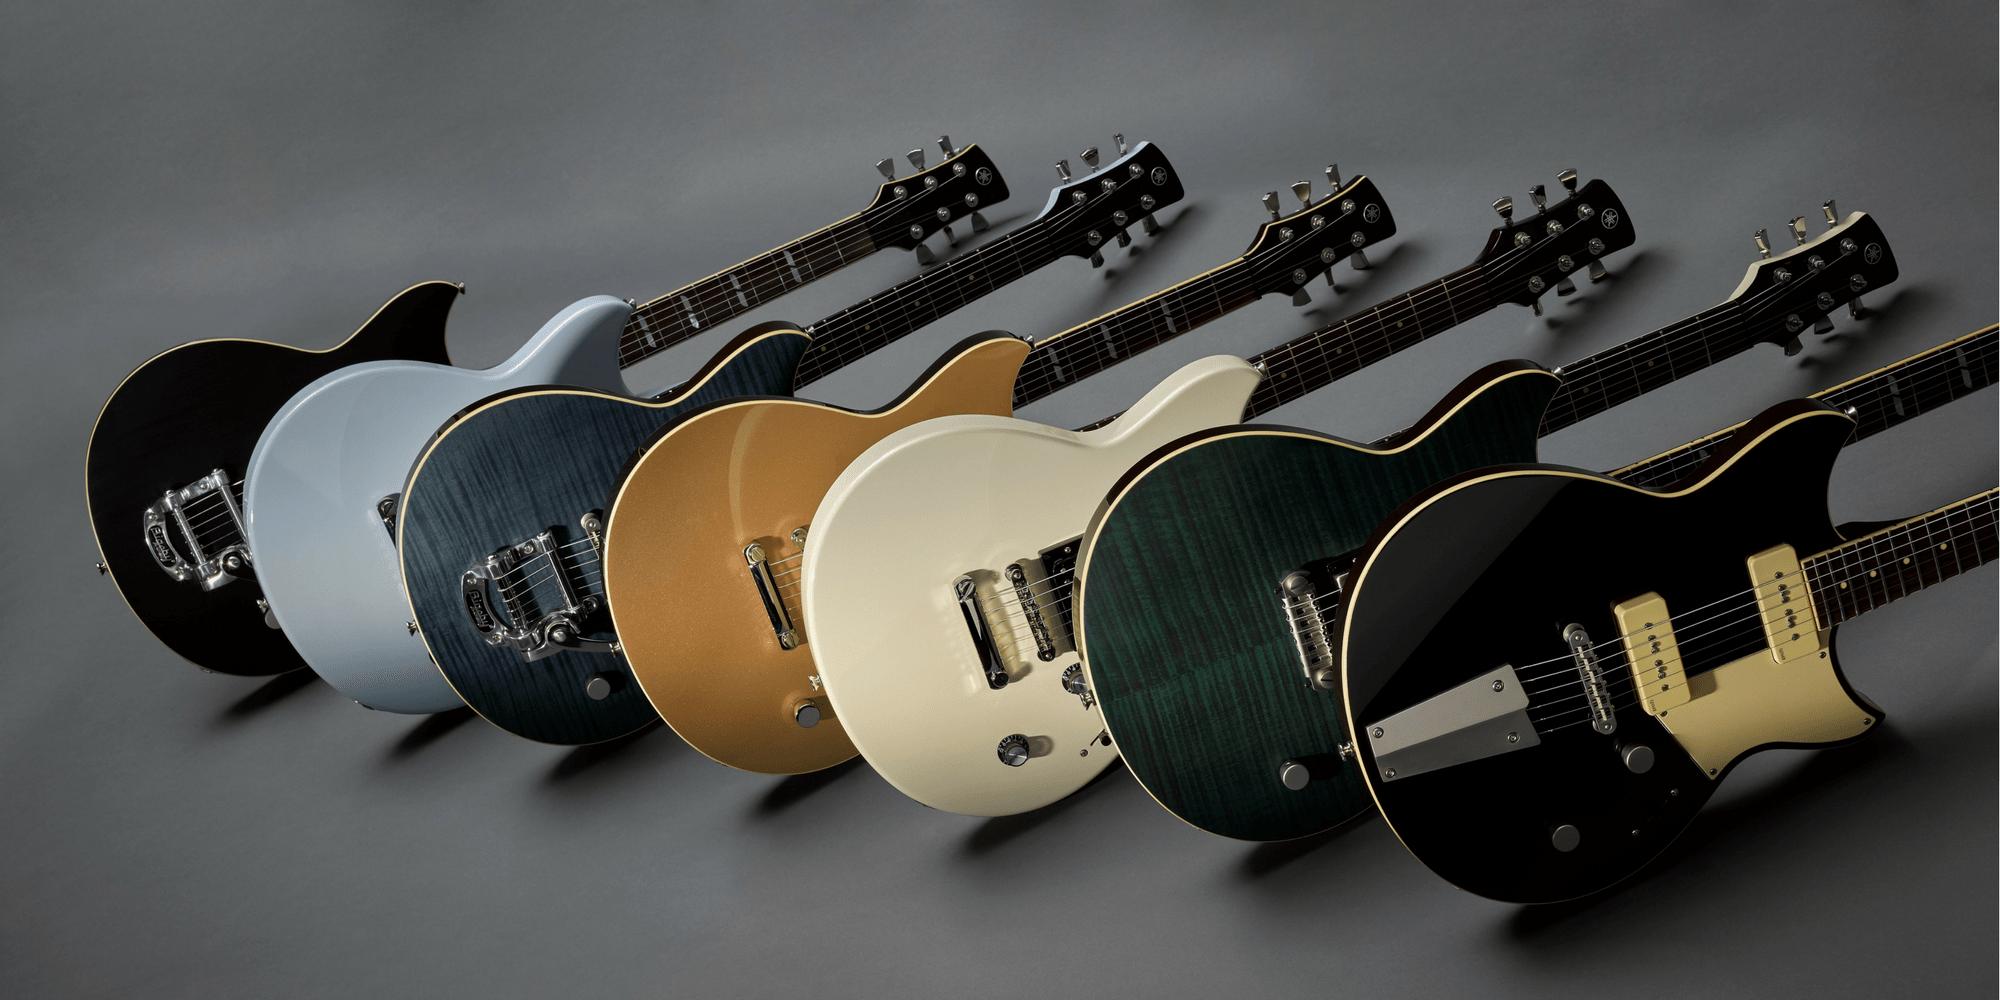 namm 2018 yamaha adds 6 new guitars to its revstar range the guitar magazine. Black Bedroom Furniture Sets. Home Design Ideas